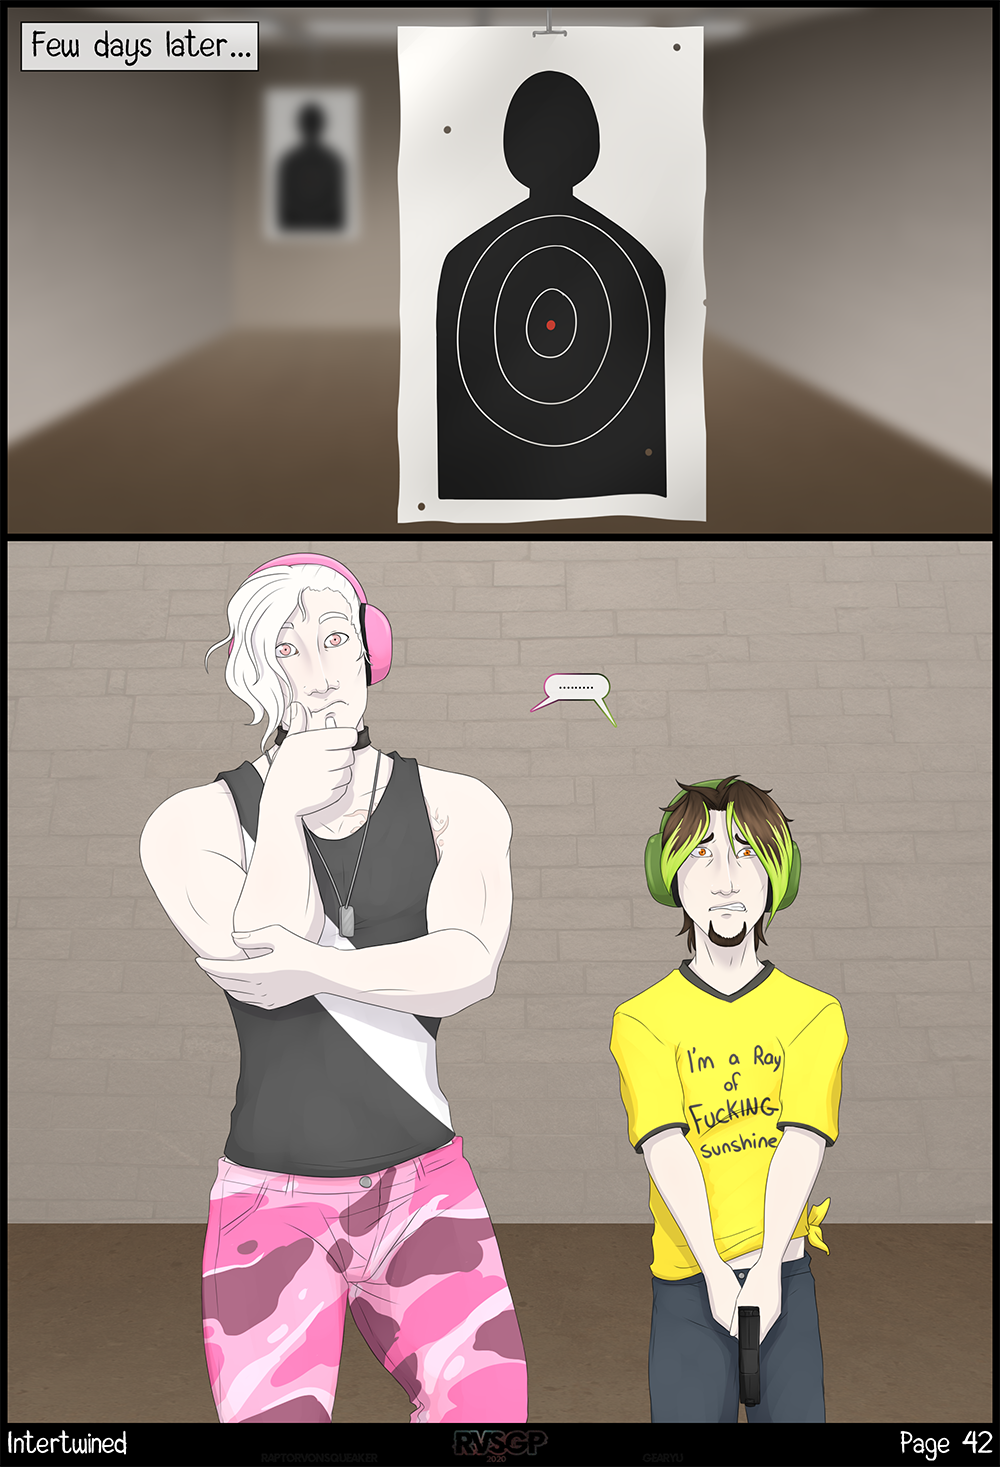 Page 42 - Bad aim.